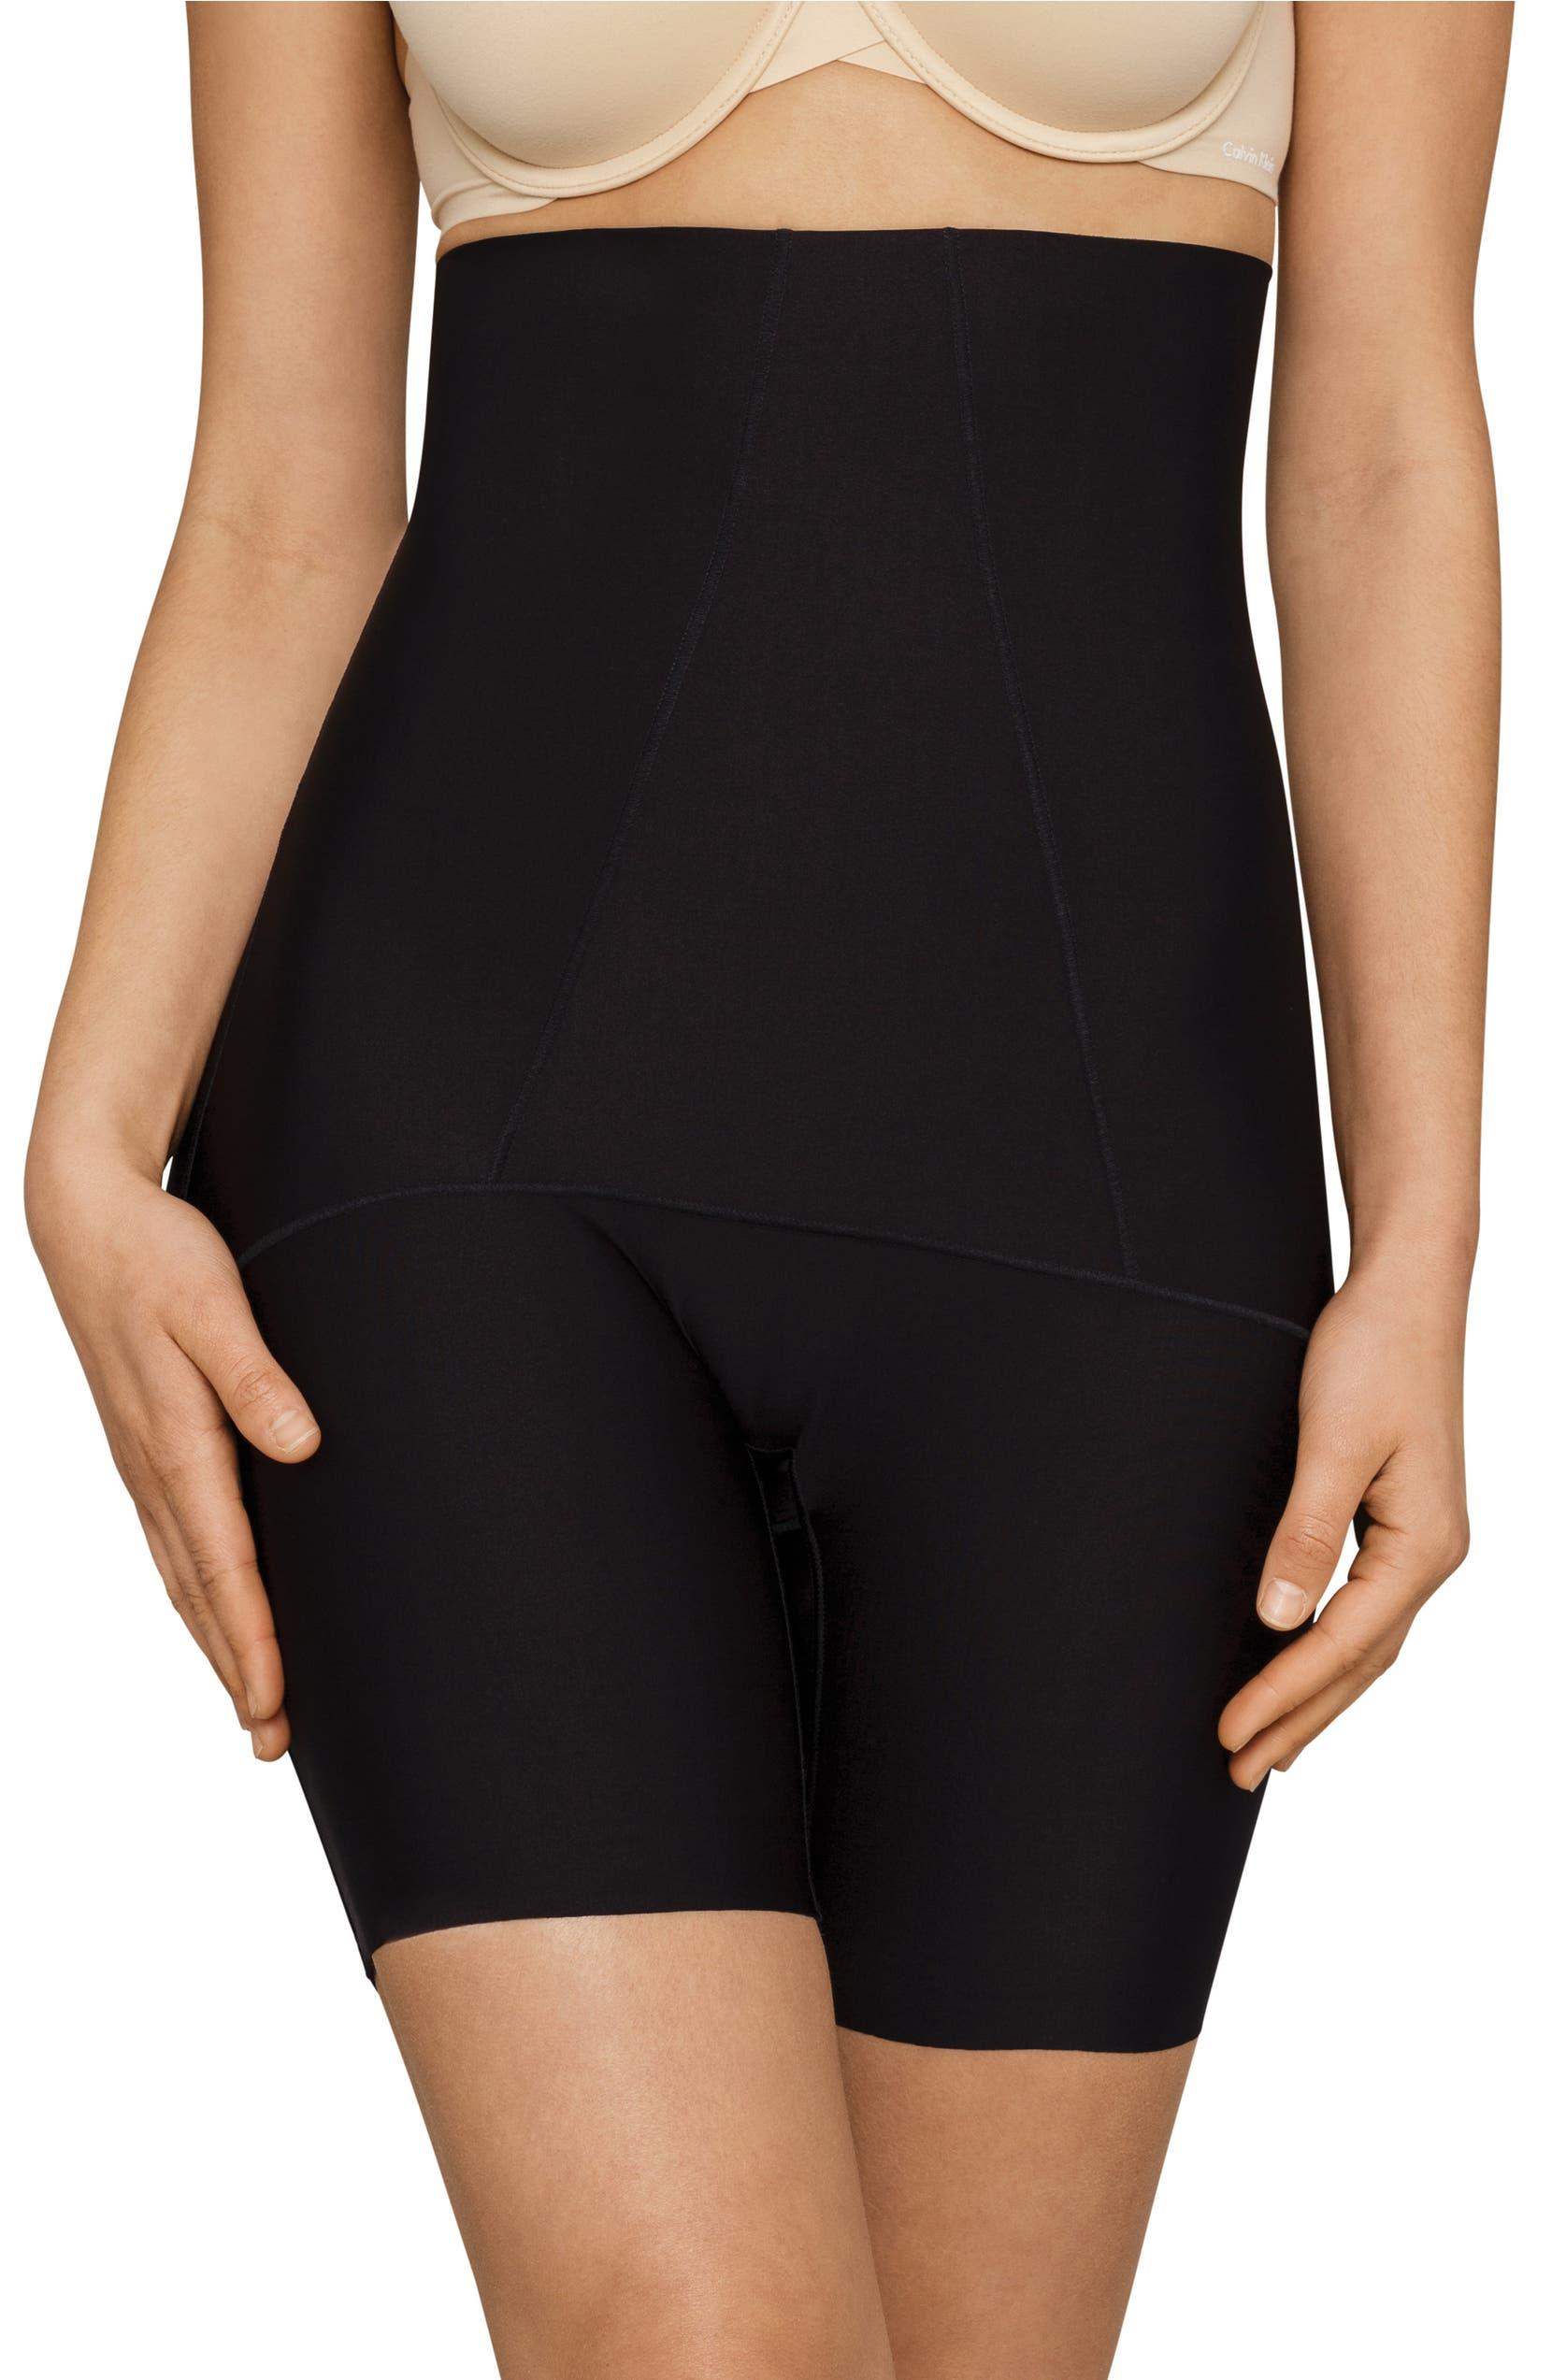 c1872ebb26260 Nancy Ganz Body Architect High Waist Shaper Shorts